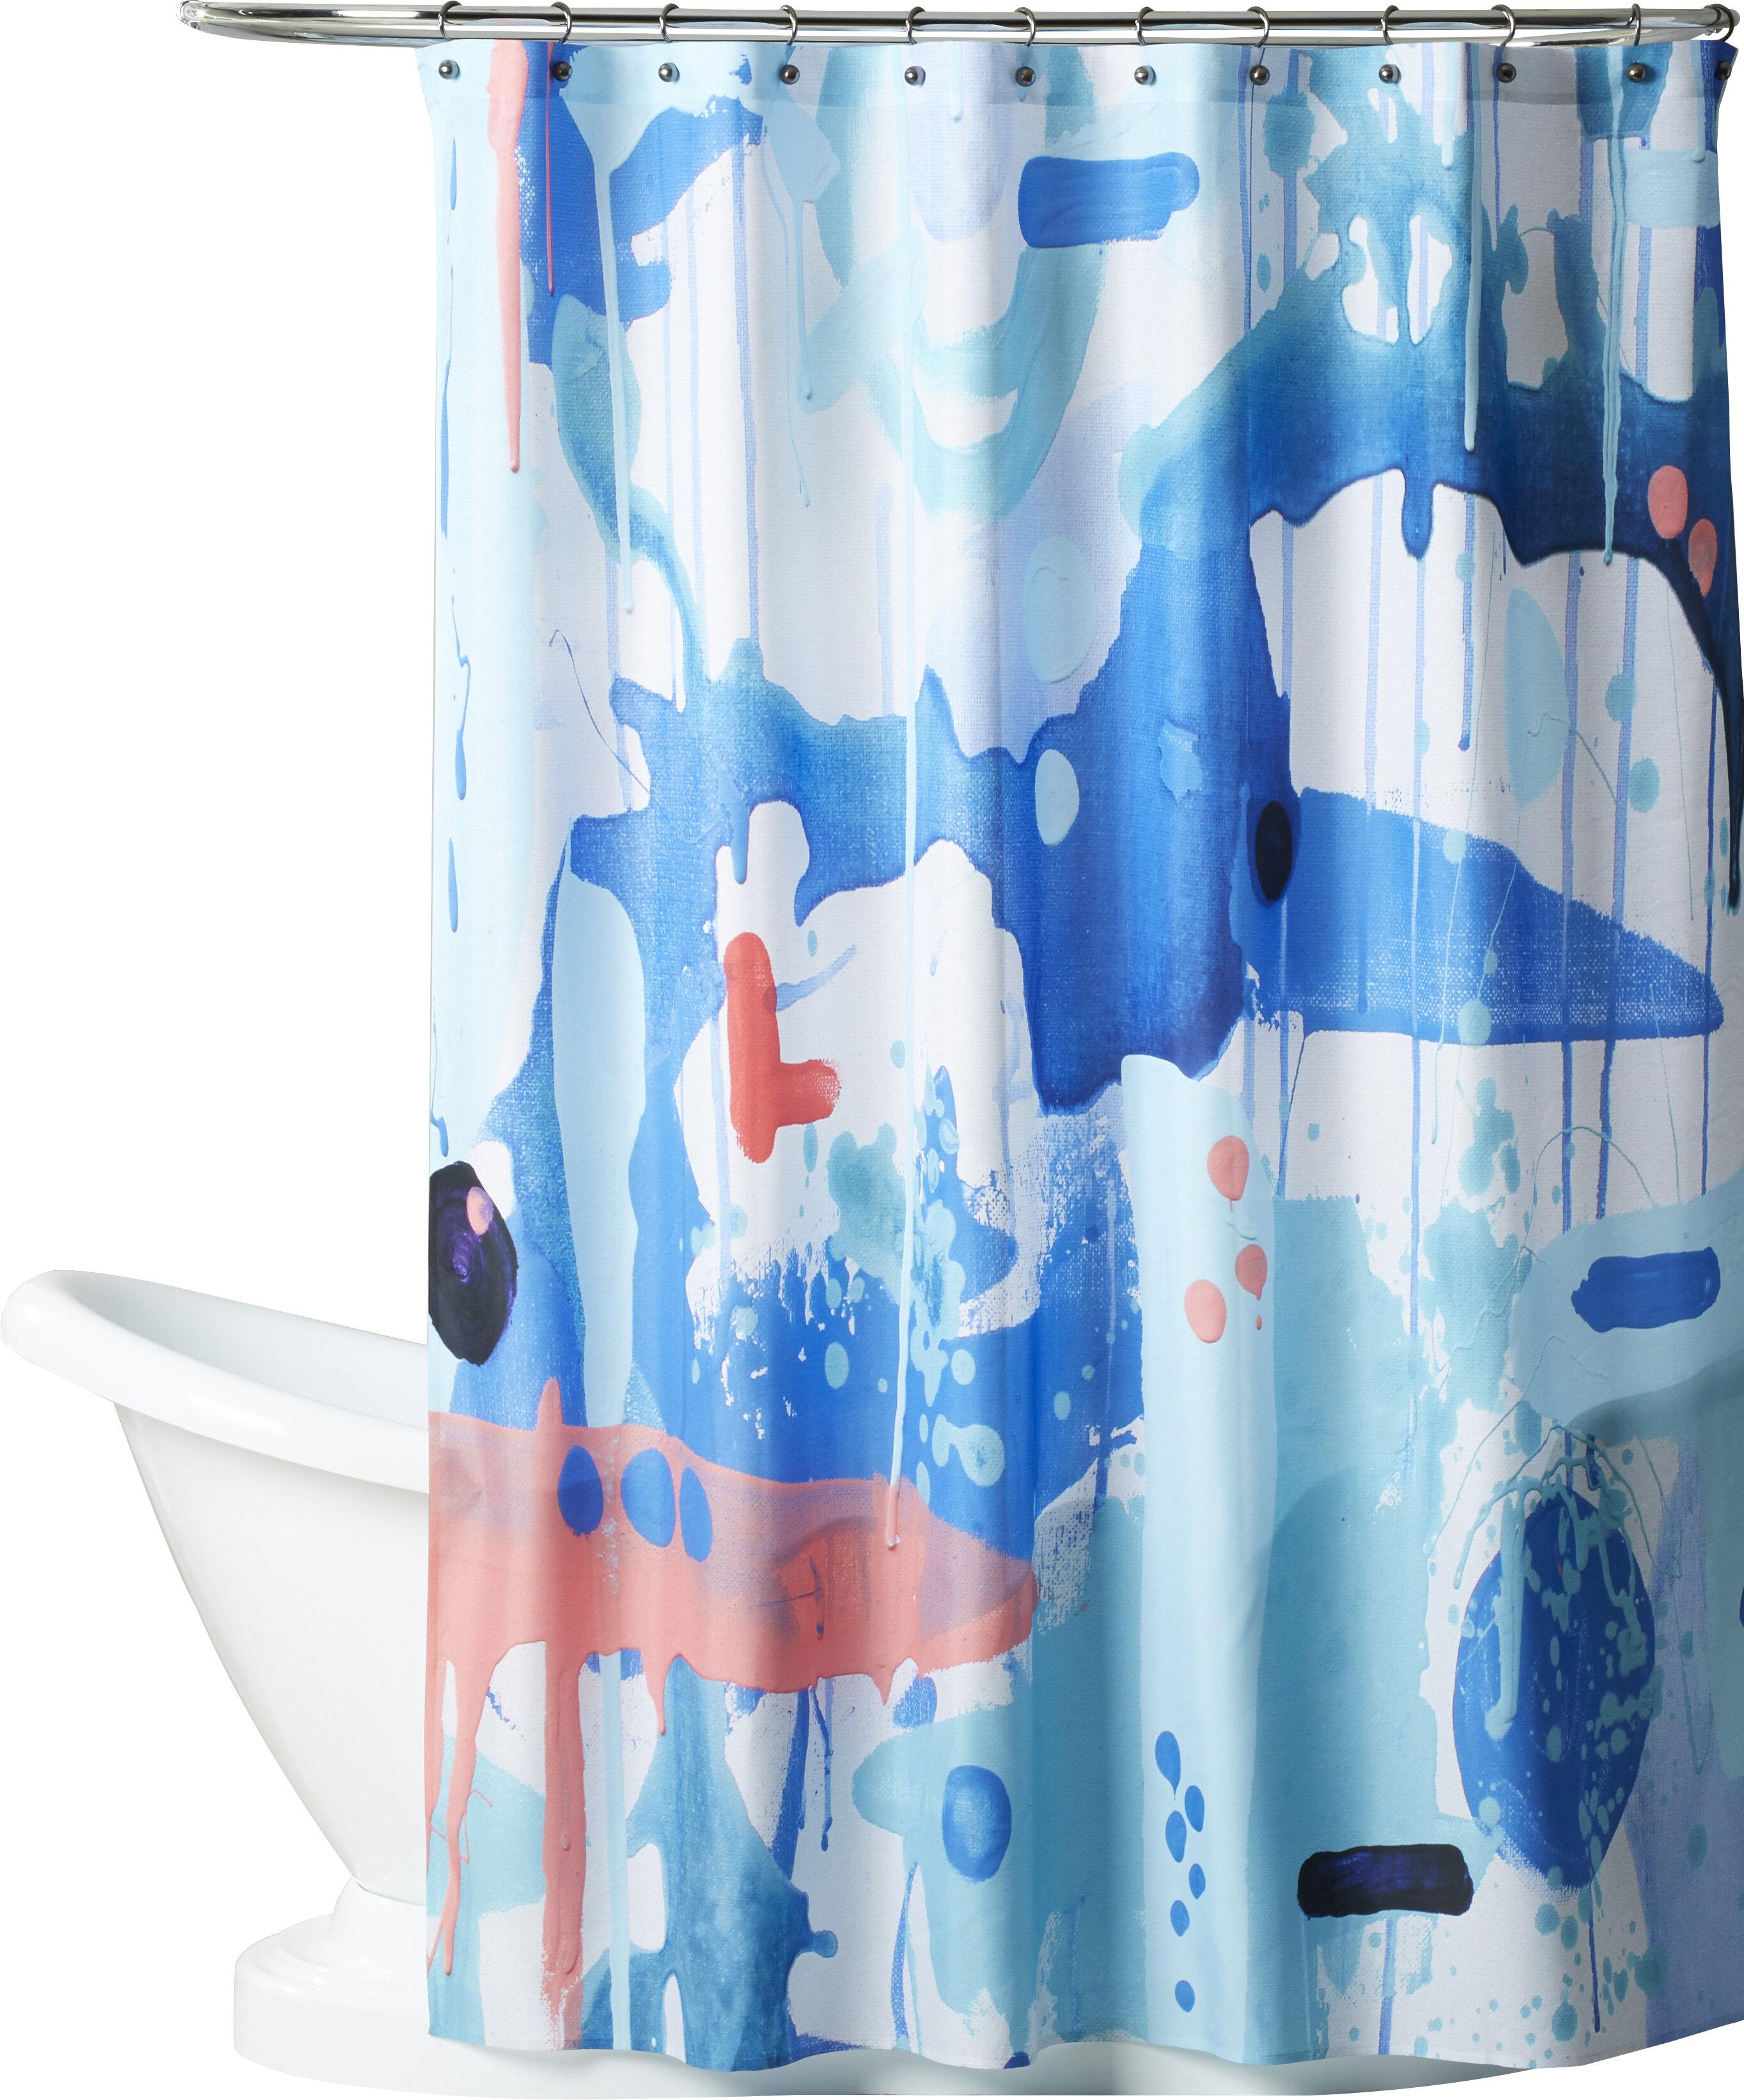 Deb Mcnaughton Abstract Drips Single Shower Curtain Allmodern